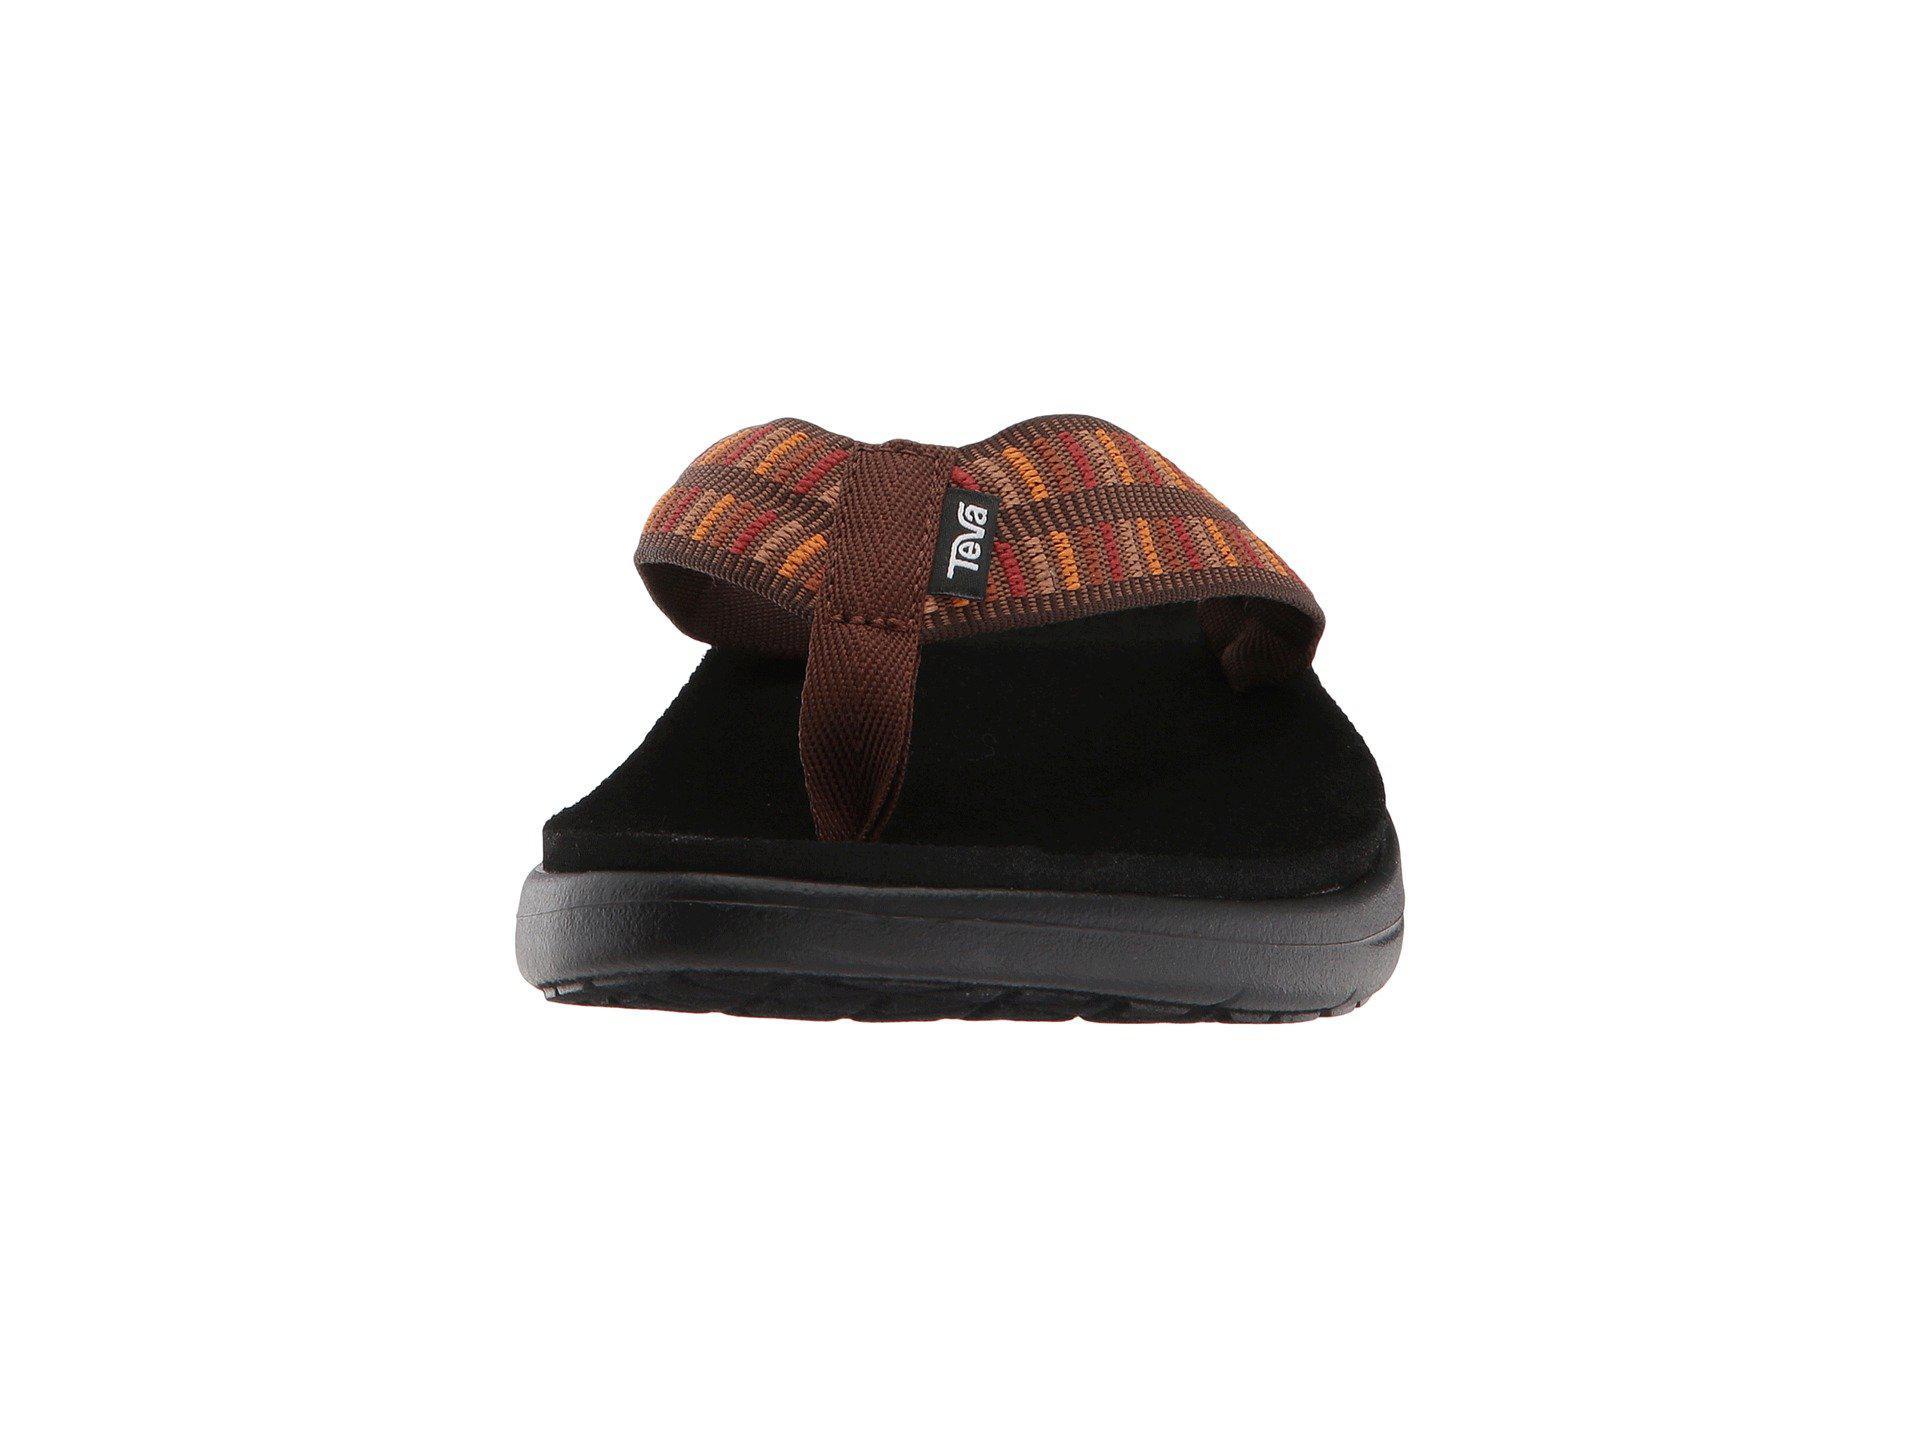 ccb88a485f216 Teva - Multicolor Voya Flip (zook Black) Men s Sandals for Men - Lyst. View  fullscreen